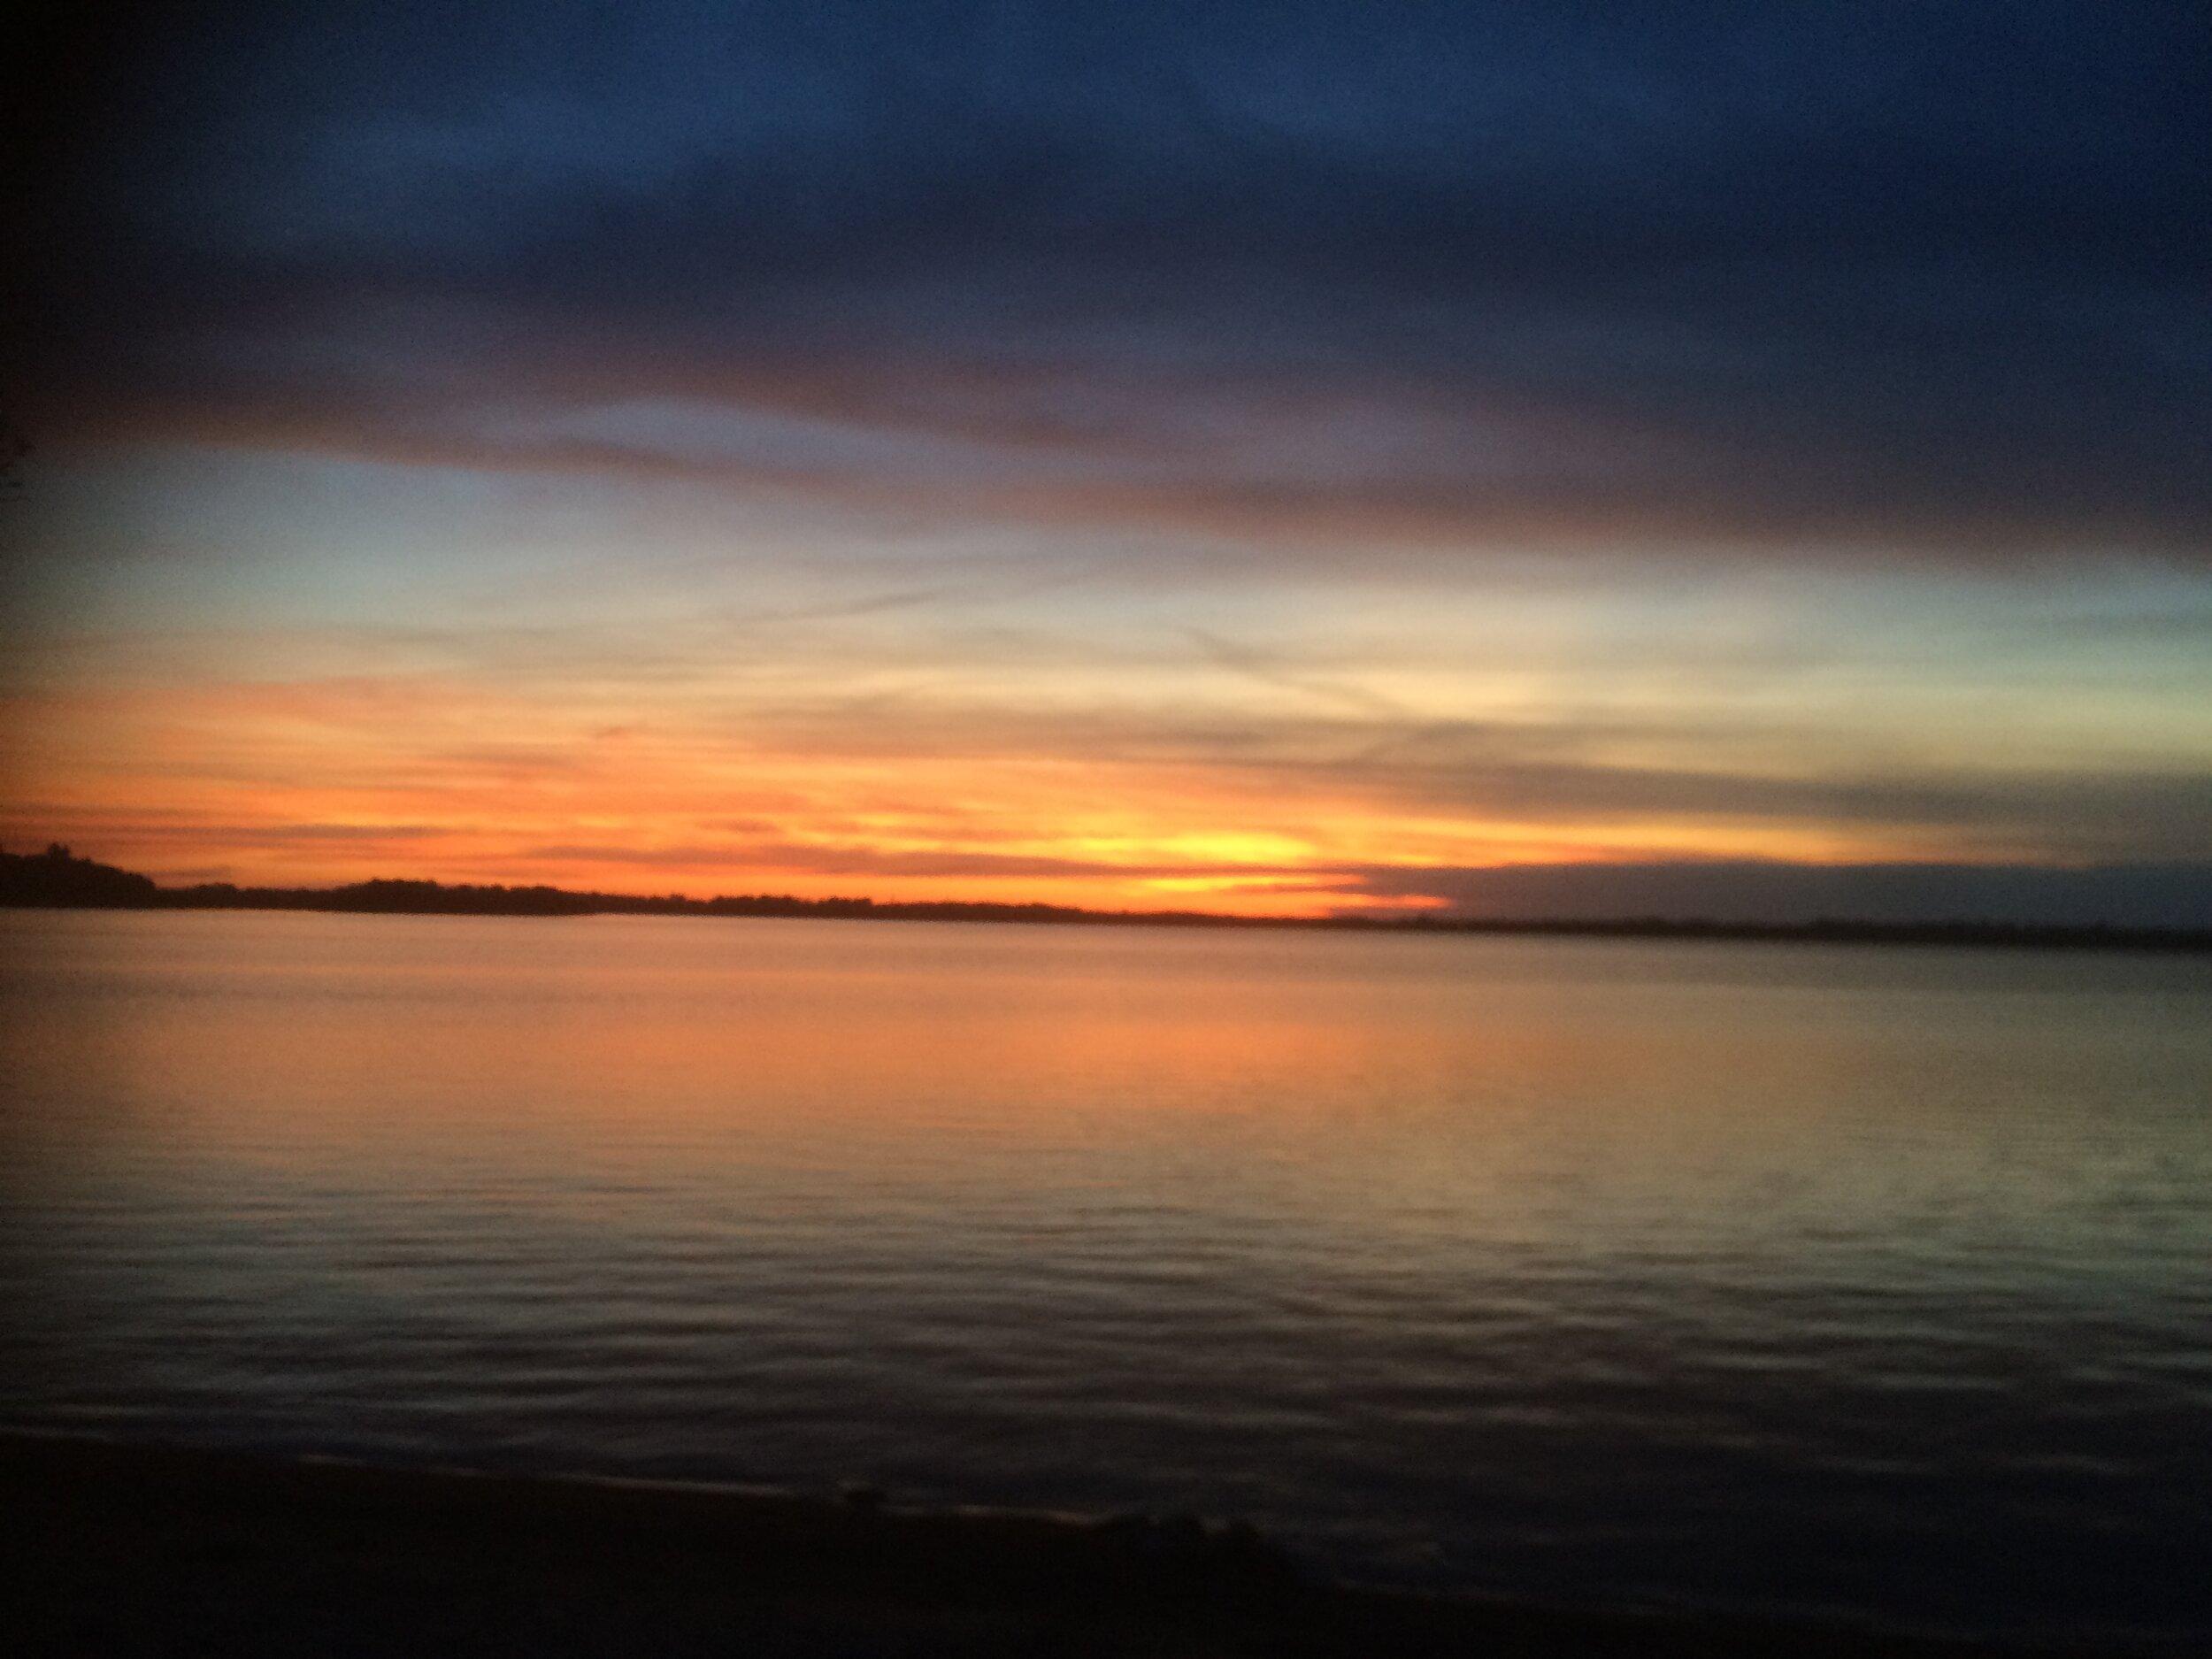 """Cameron Lake"" - Gord Demars"